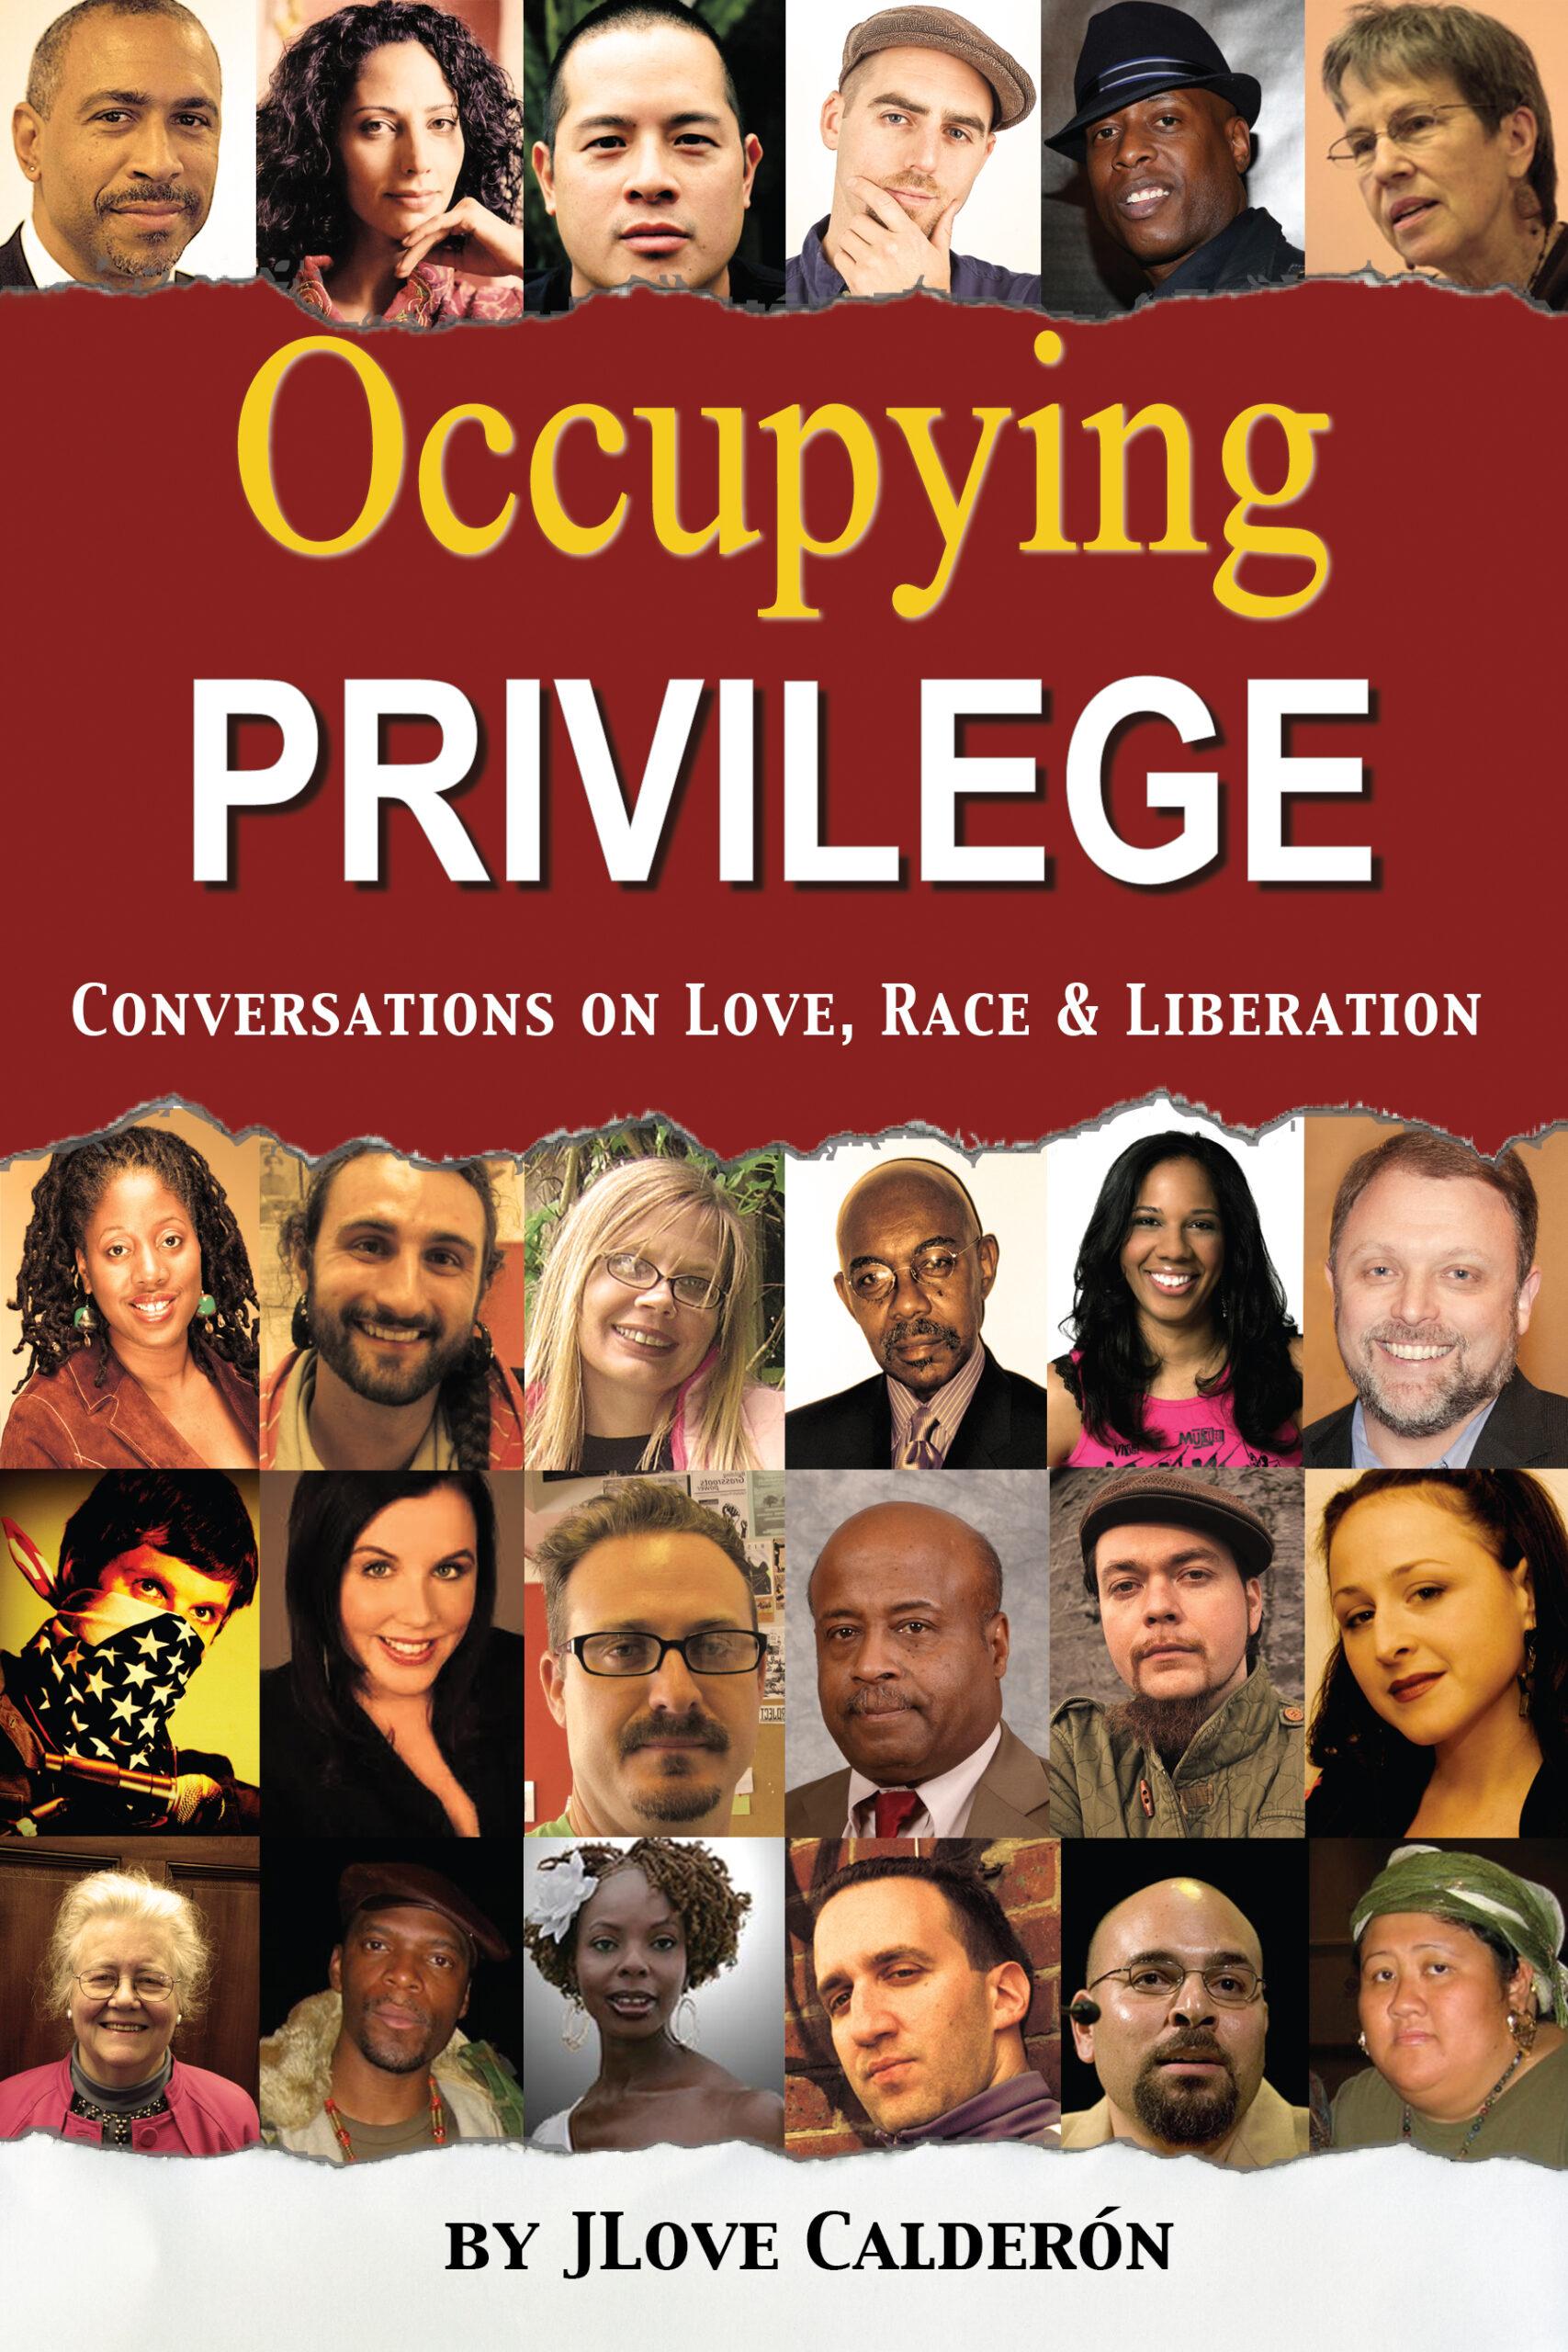 2012_AKILAWpress_JLove_OccupyingPrivilege_IMG